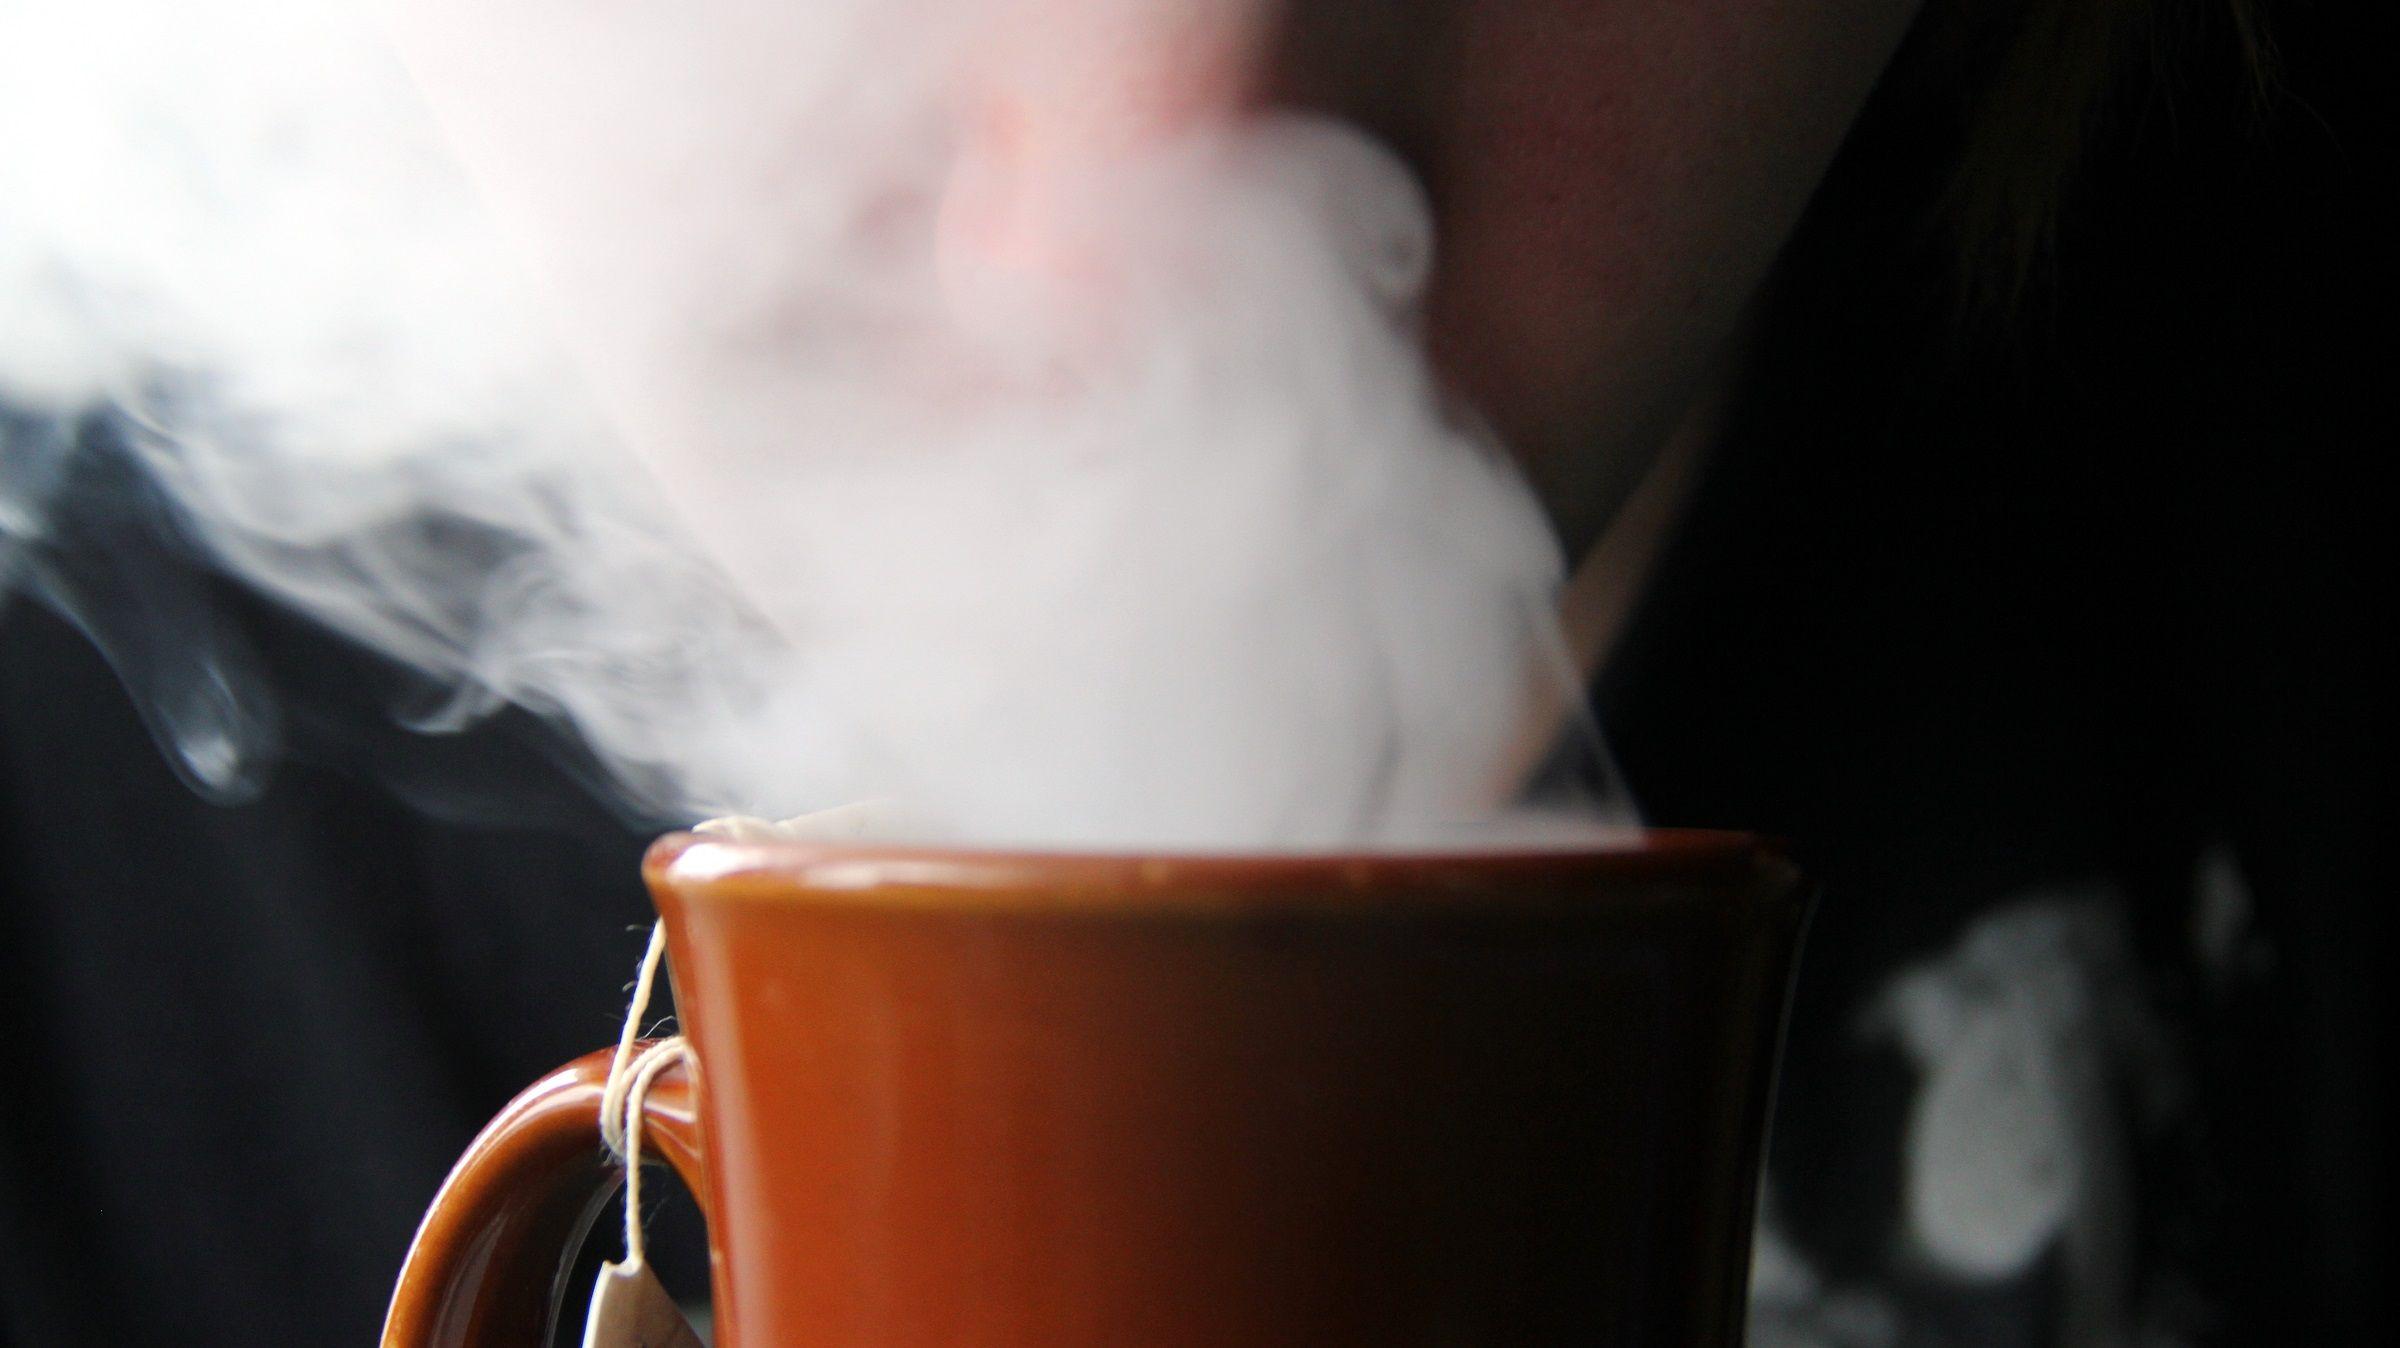 Te-ai lasat de fumat? Cum te detoxifici - Detoxifierea organismului dupa fumat